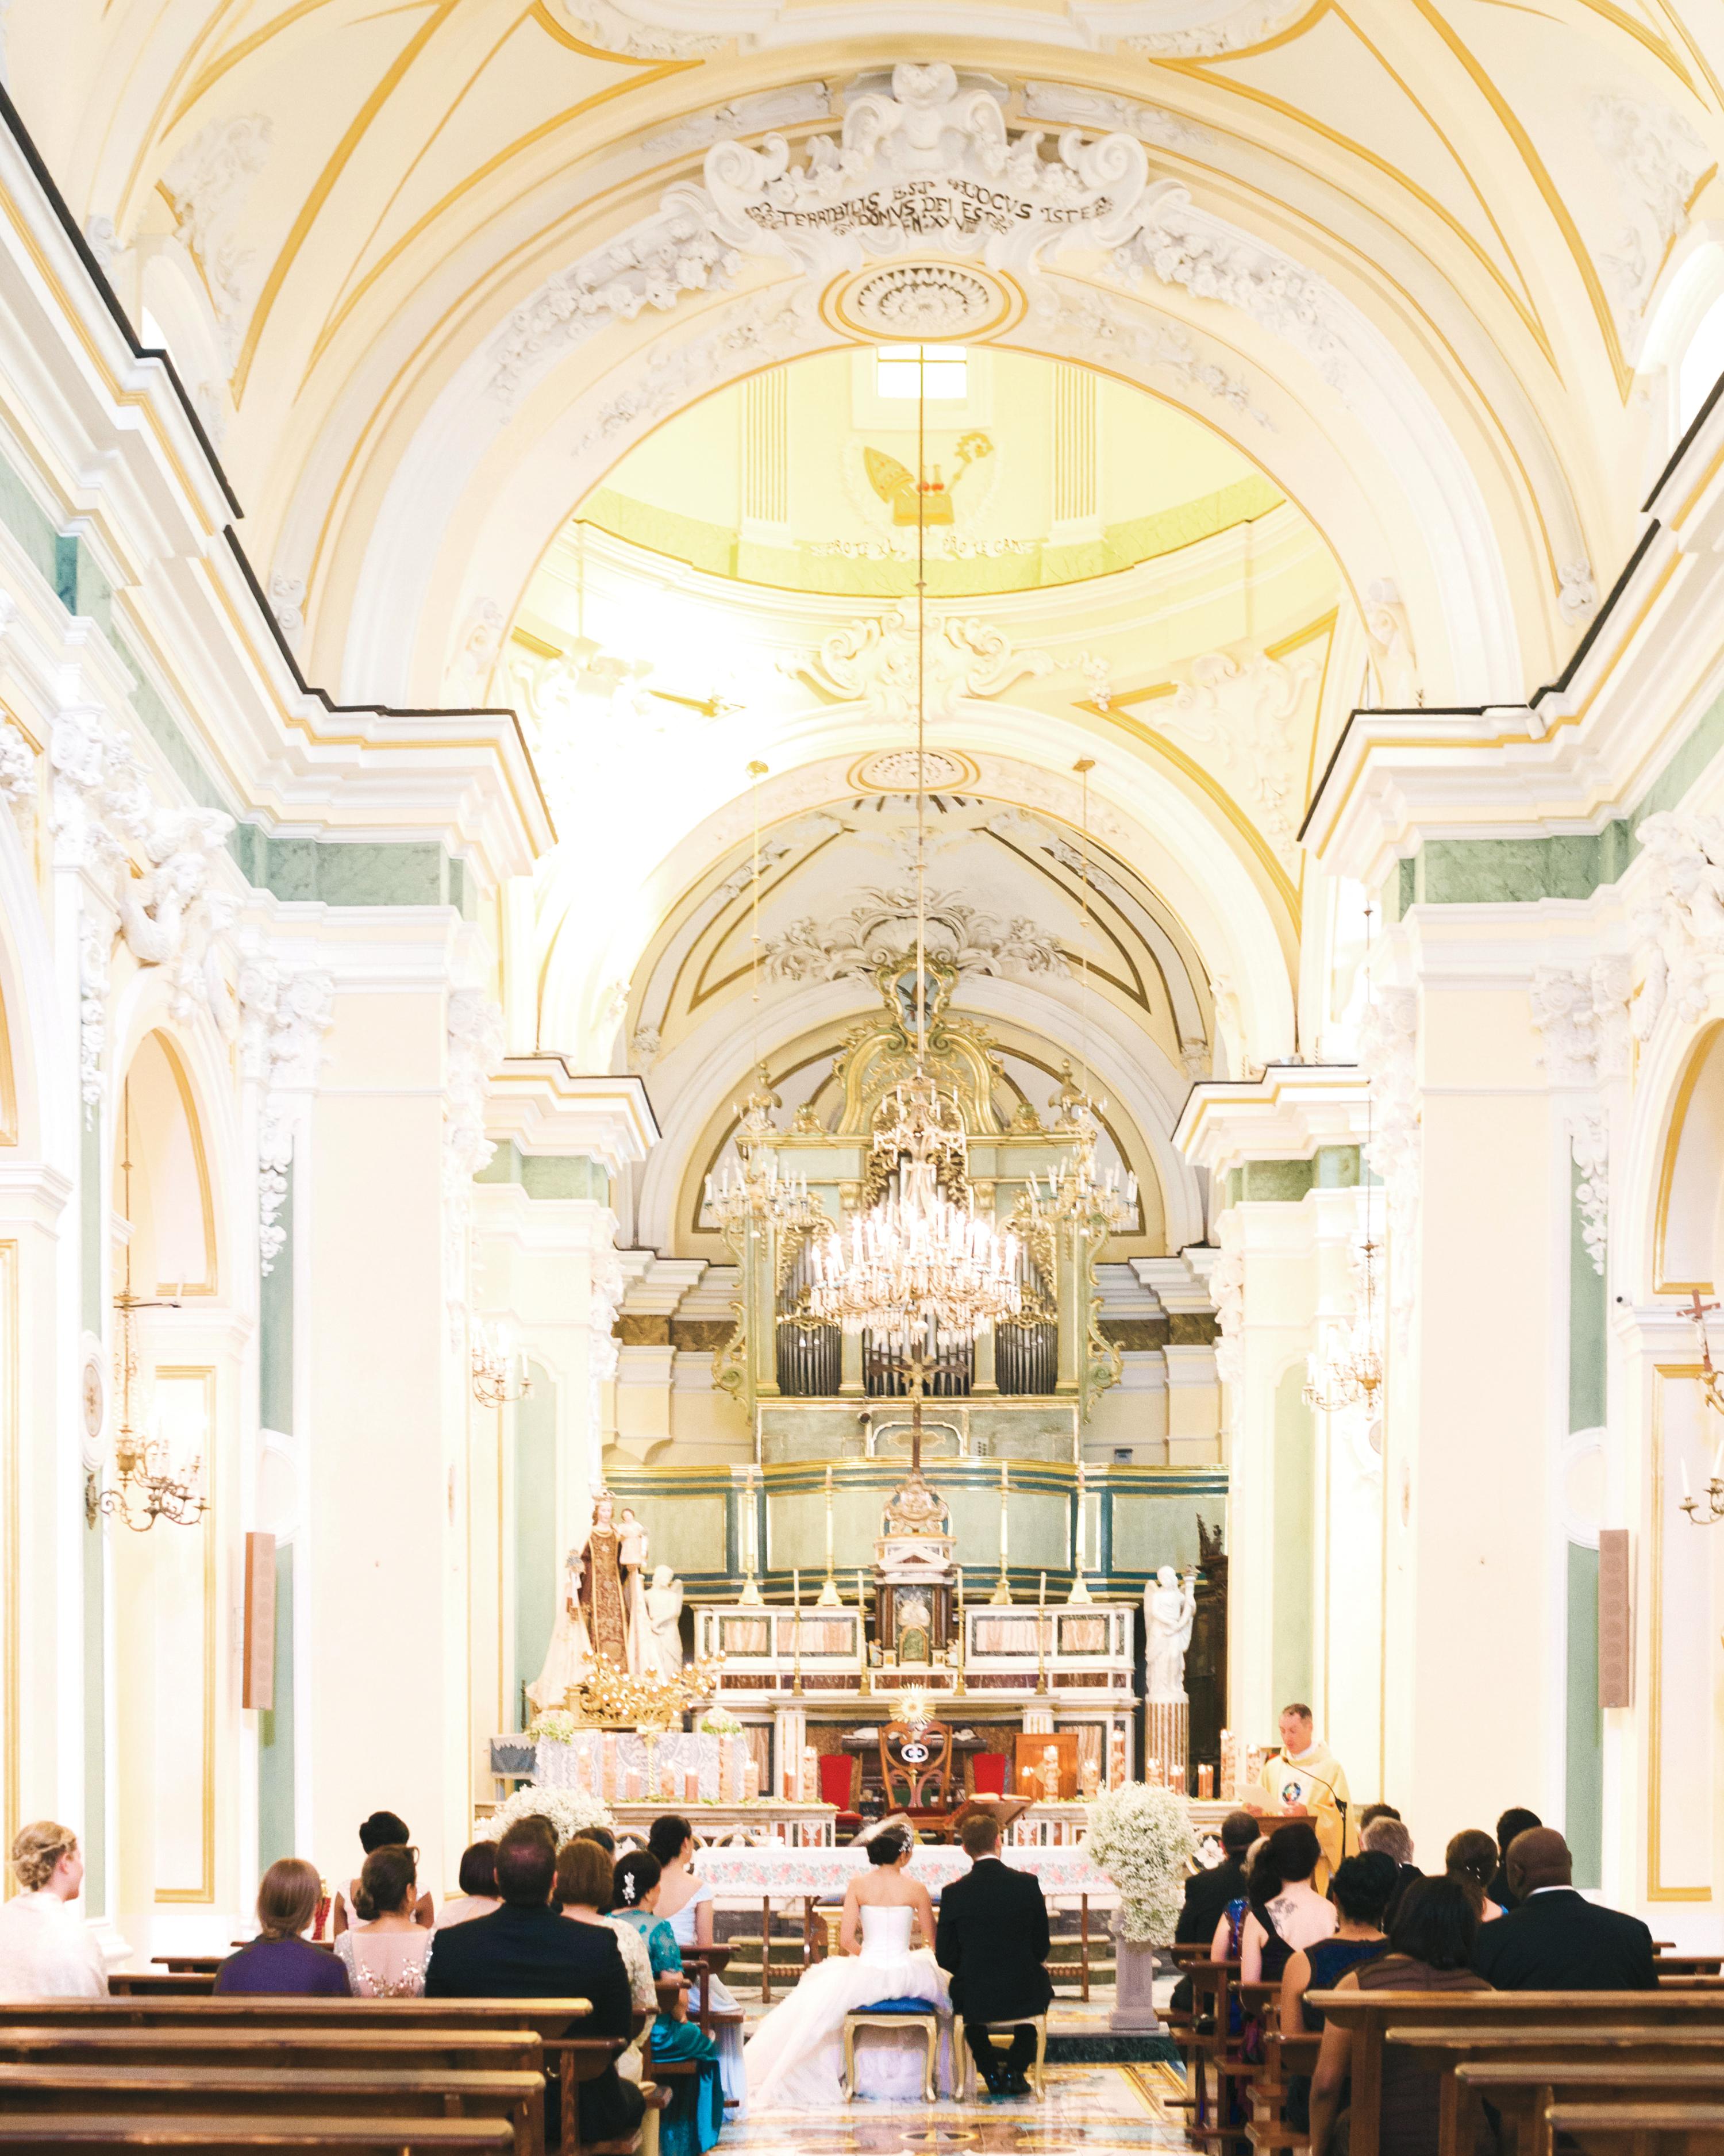 michelle-christopher-positano-ceremony-bride-groom-0521-lens-corrected-s111681.jpg